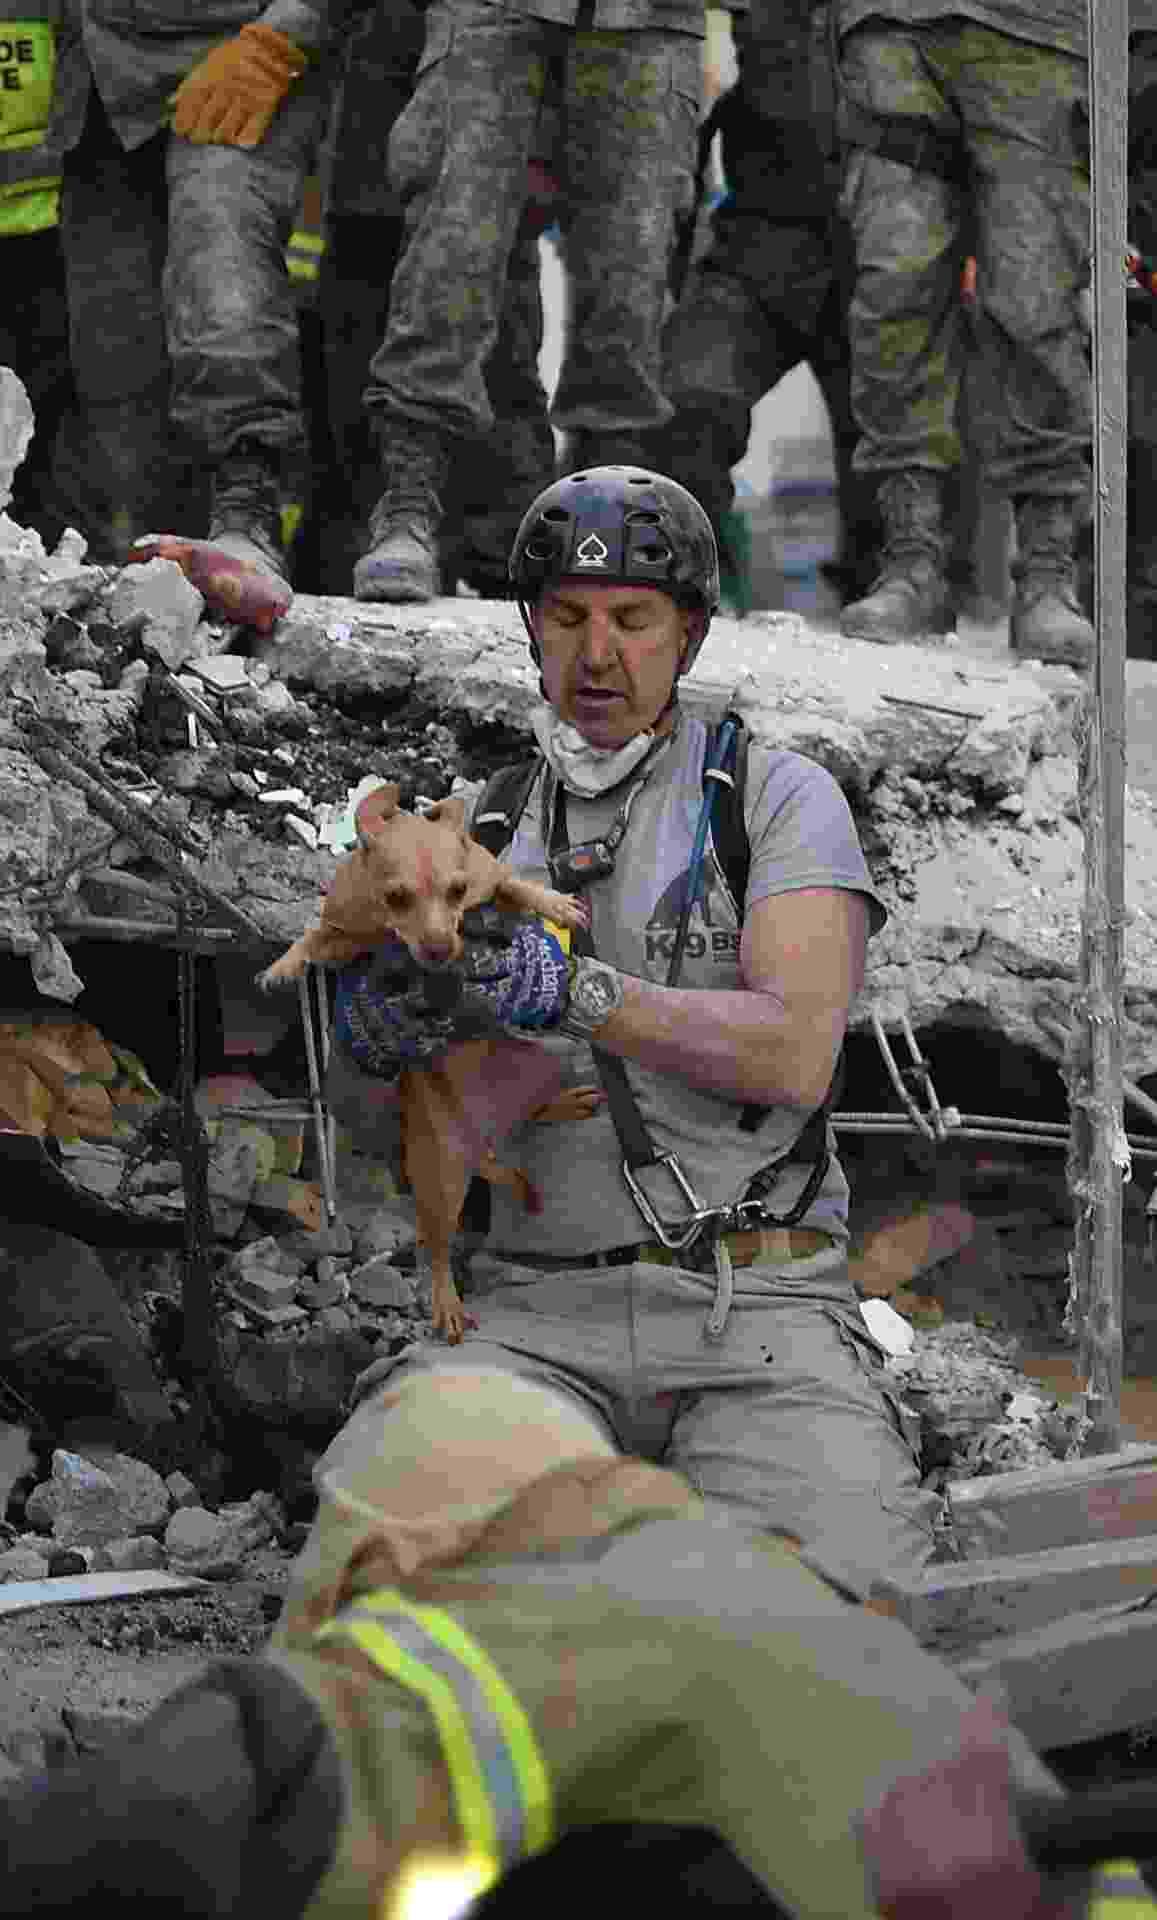 20.set.2017 -  Cachorro é retirado de escombros de edifício destruído após forte terremoto atingir a Cidade do México - YURI CORTEZ/AFP